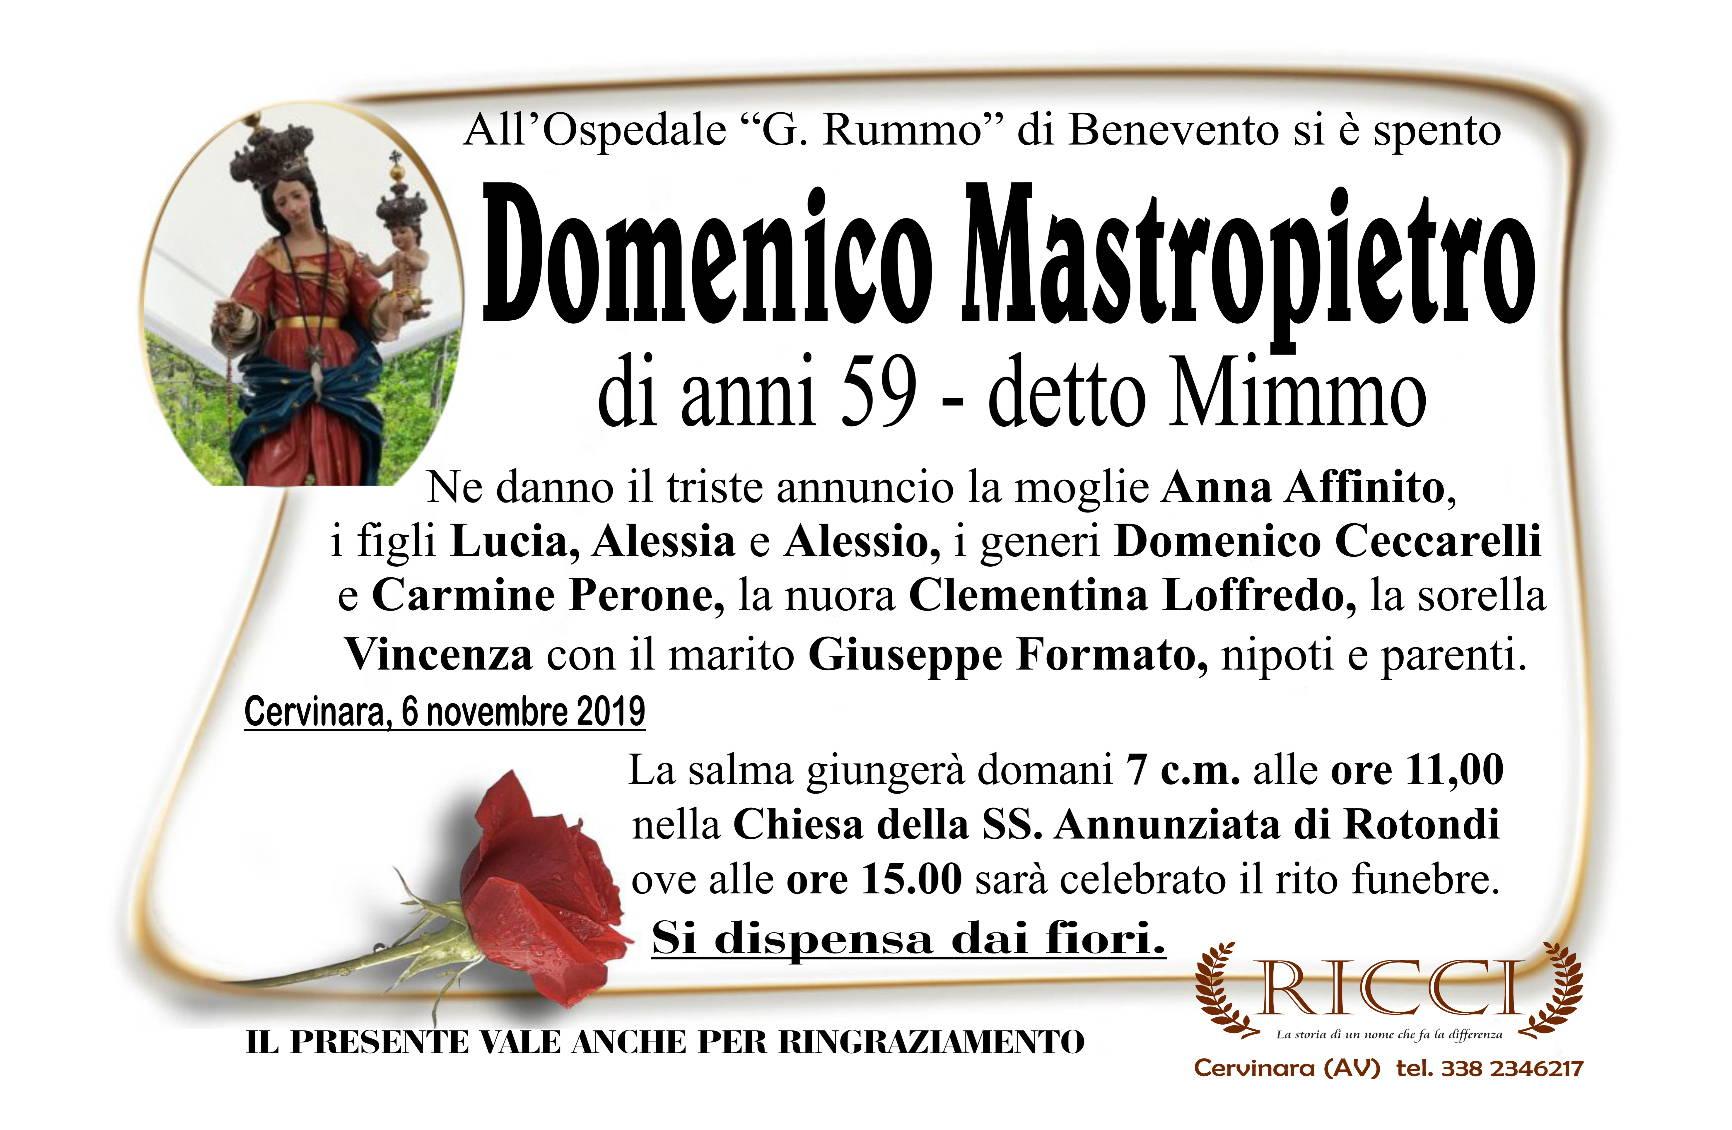 Domenico Mastropietro